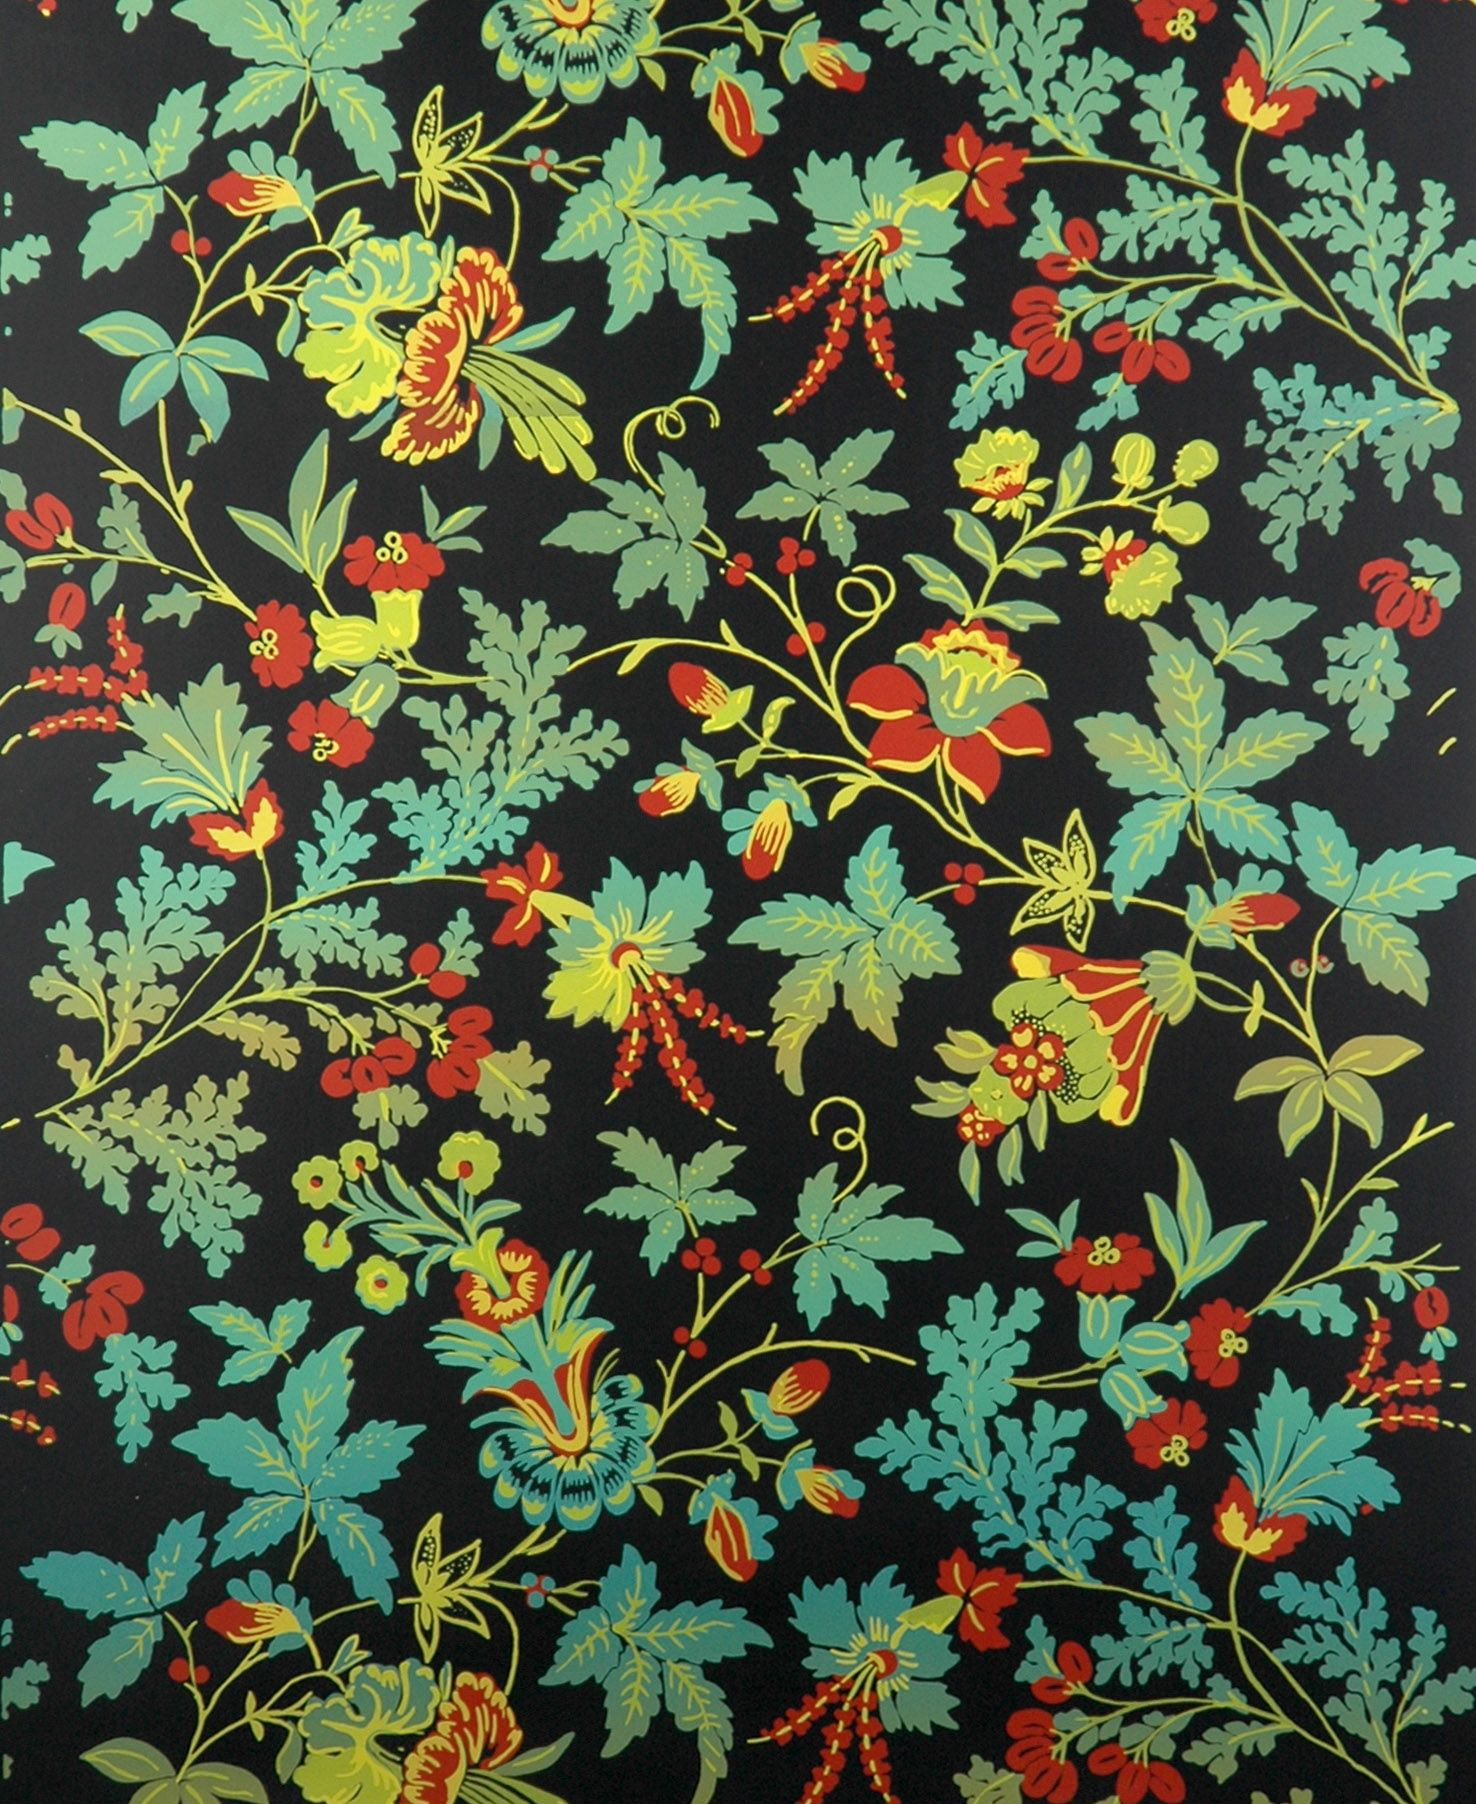 Tapeten historische tapeten hembus gmbh tapeten for Farben und tapeten